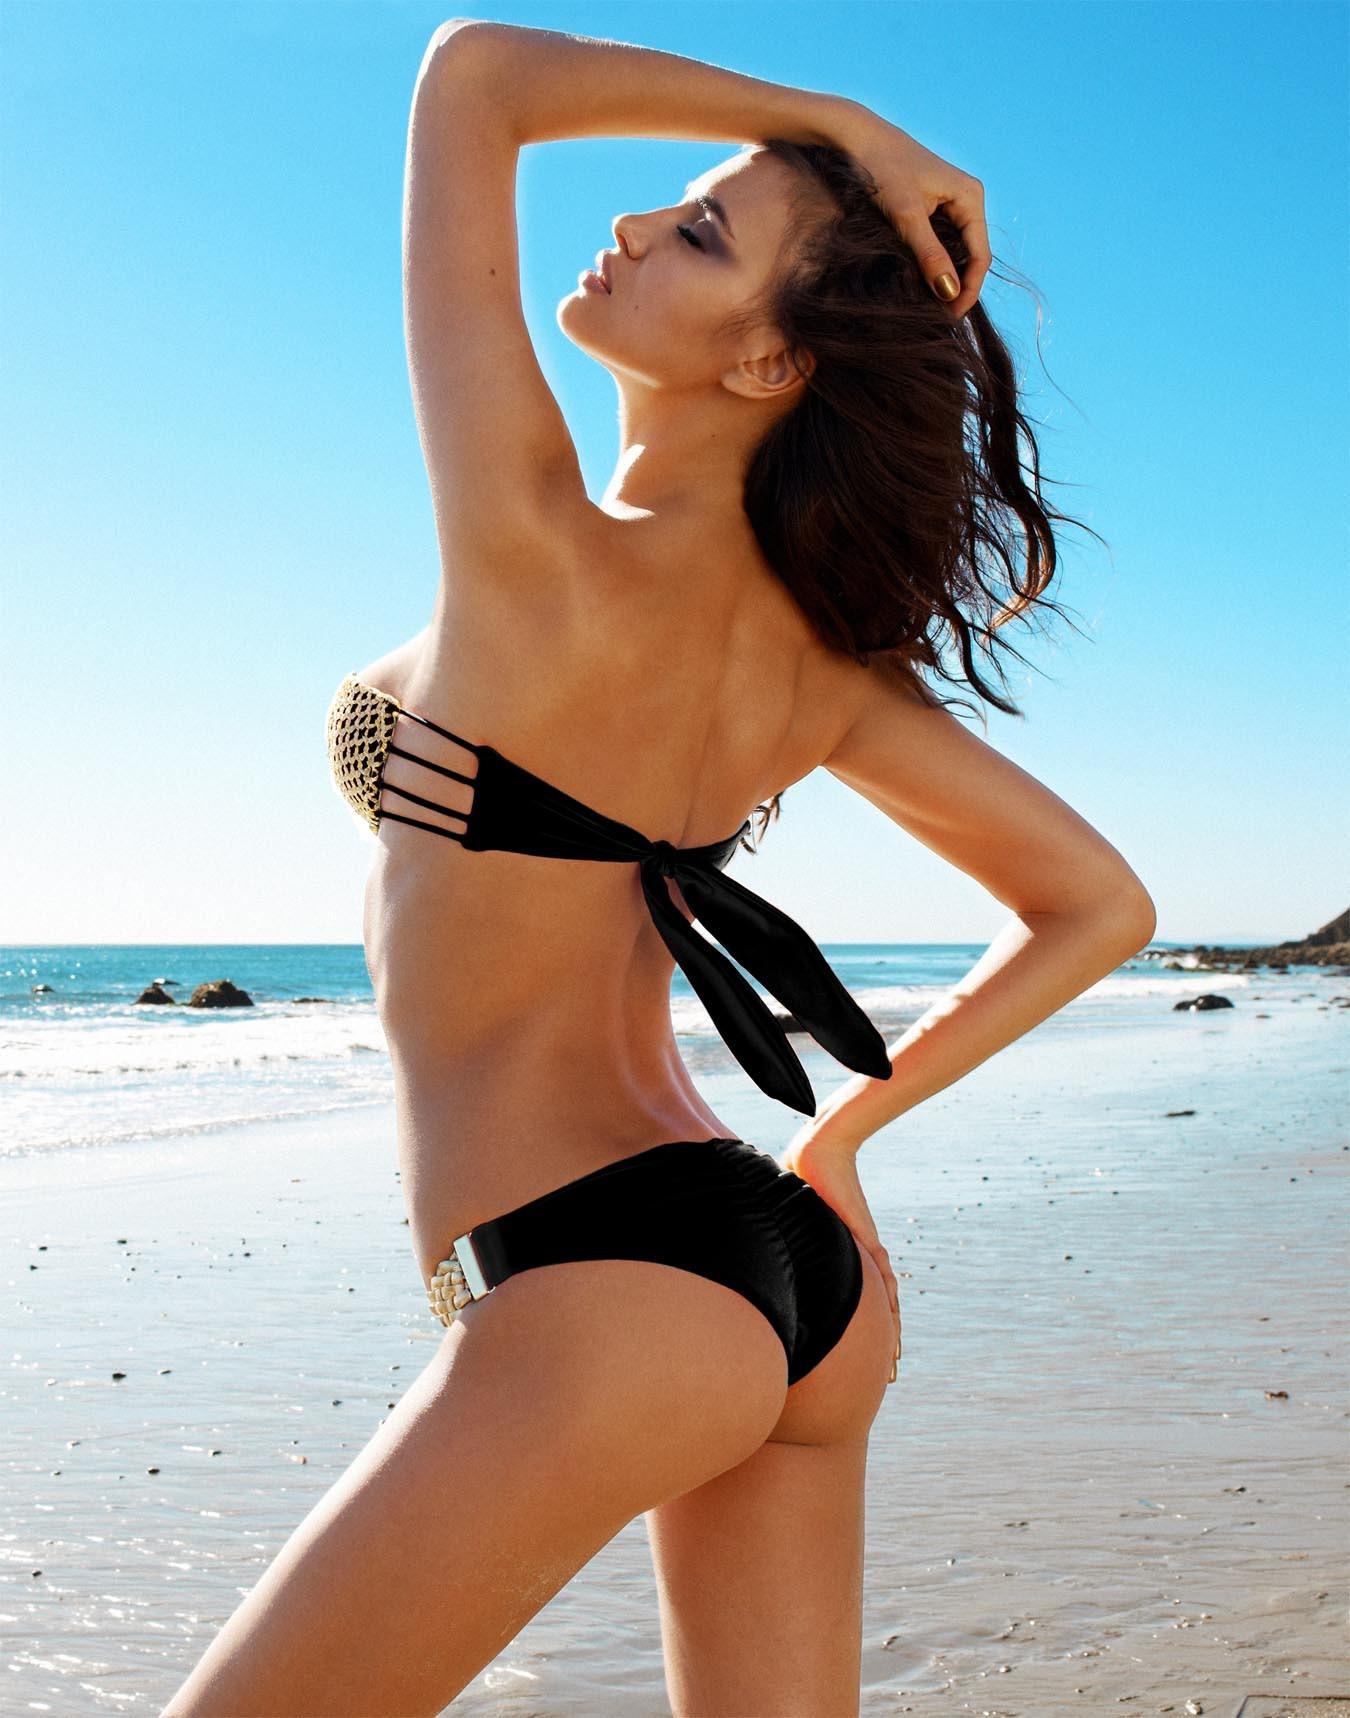 Irina-Shayk-Beach-Bunny-Photoshoot-25